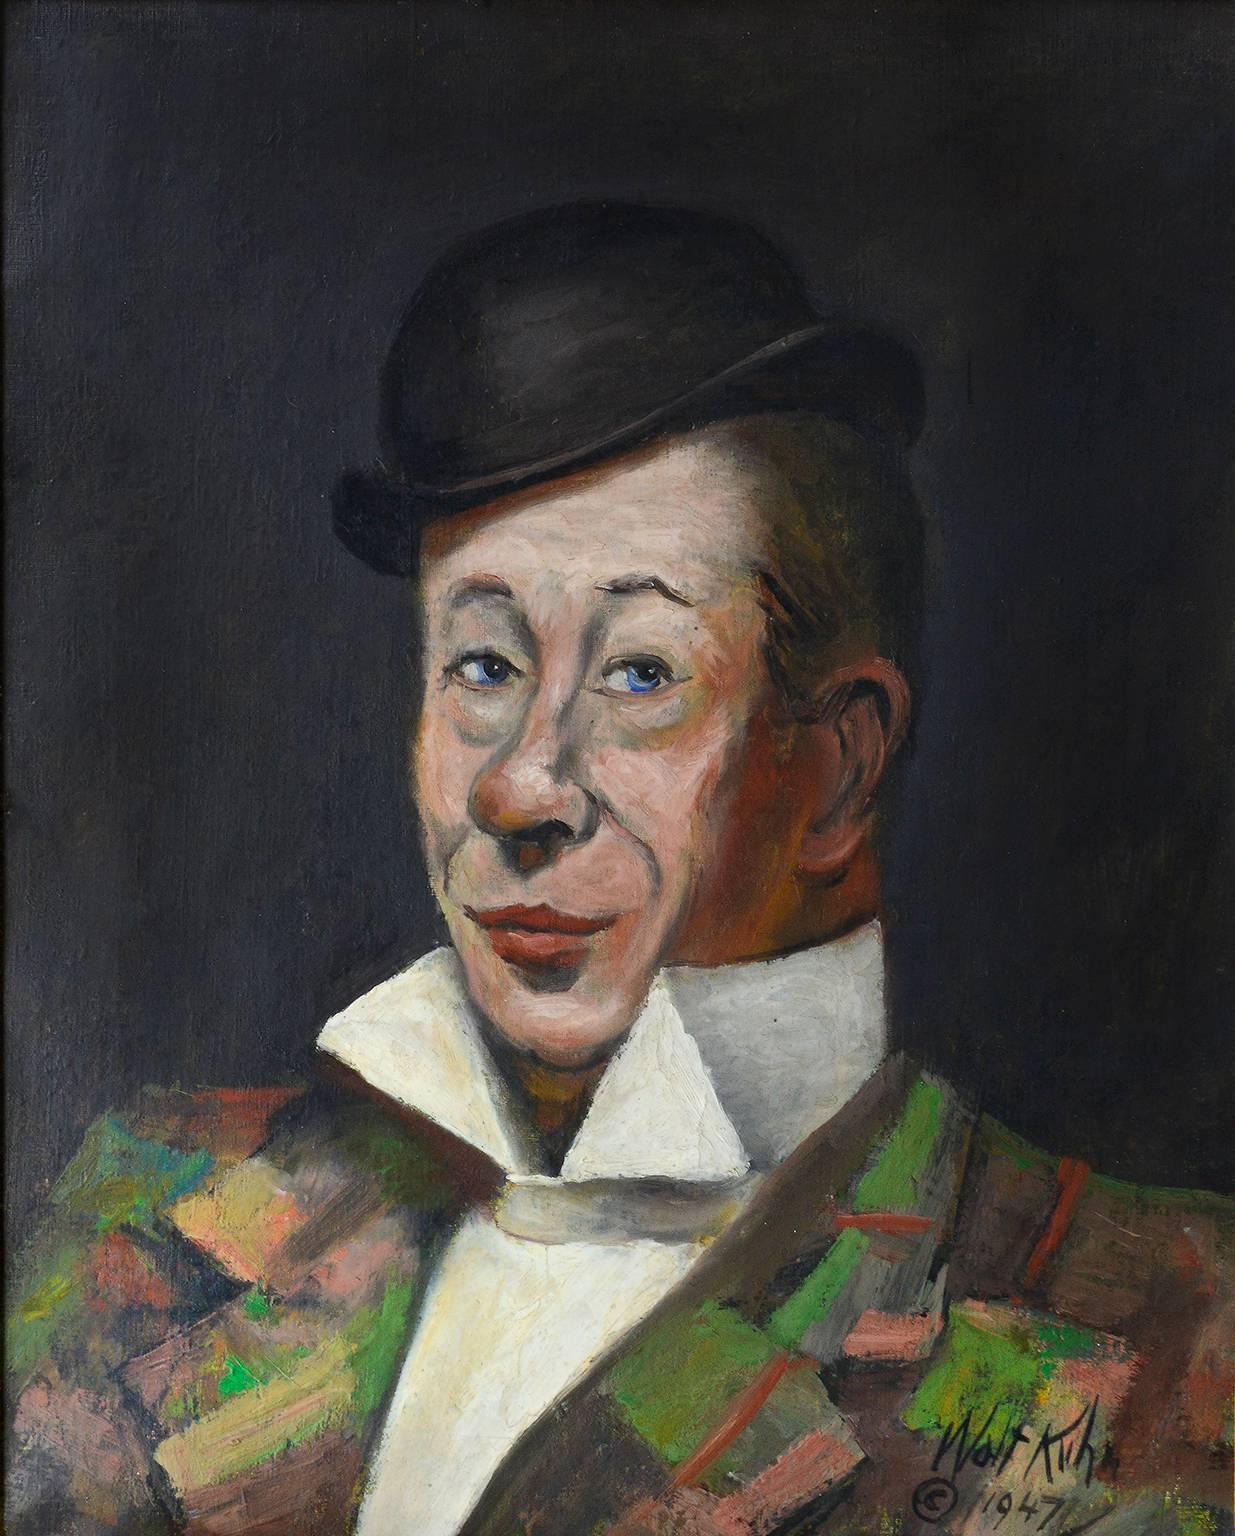 Portrait of Bert Lahr -  Circus Performer - Modernism